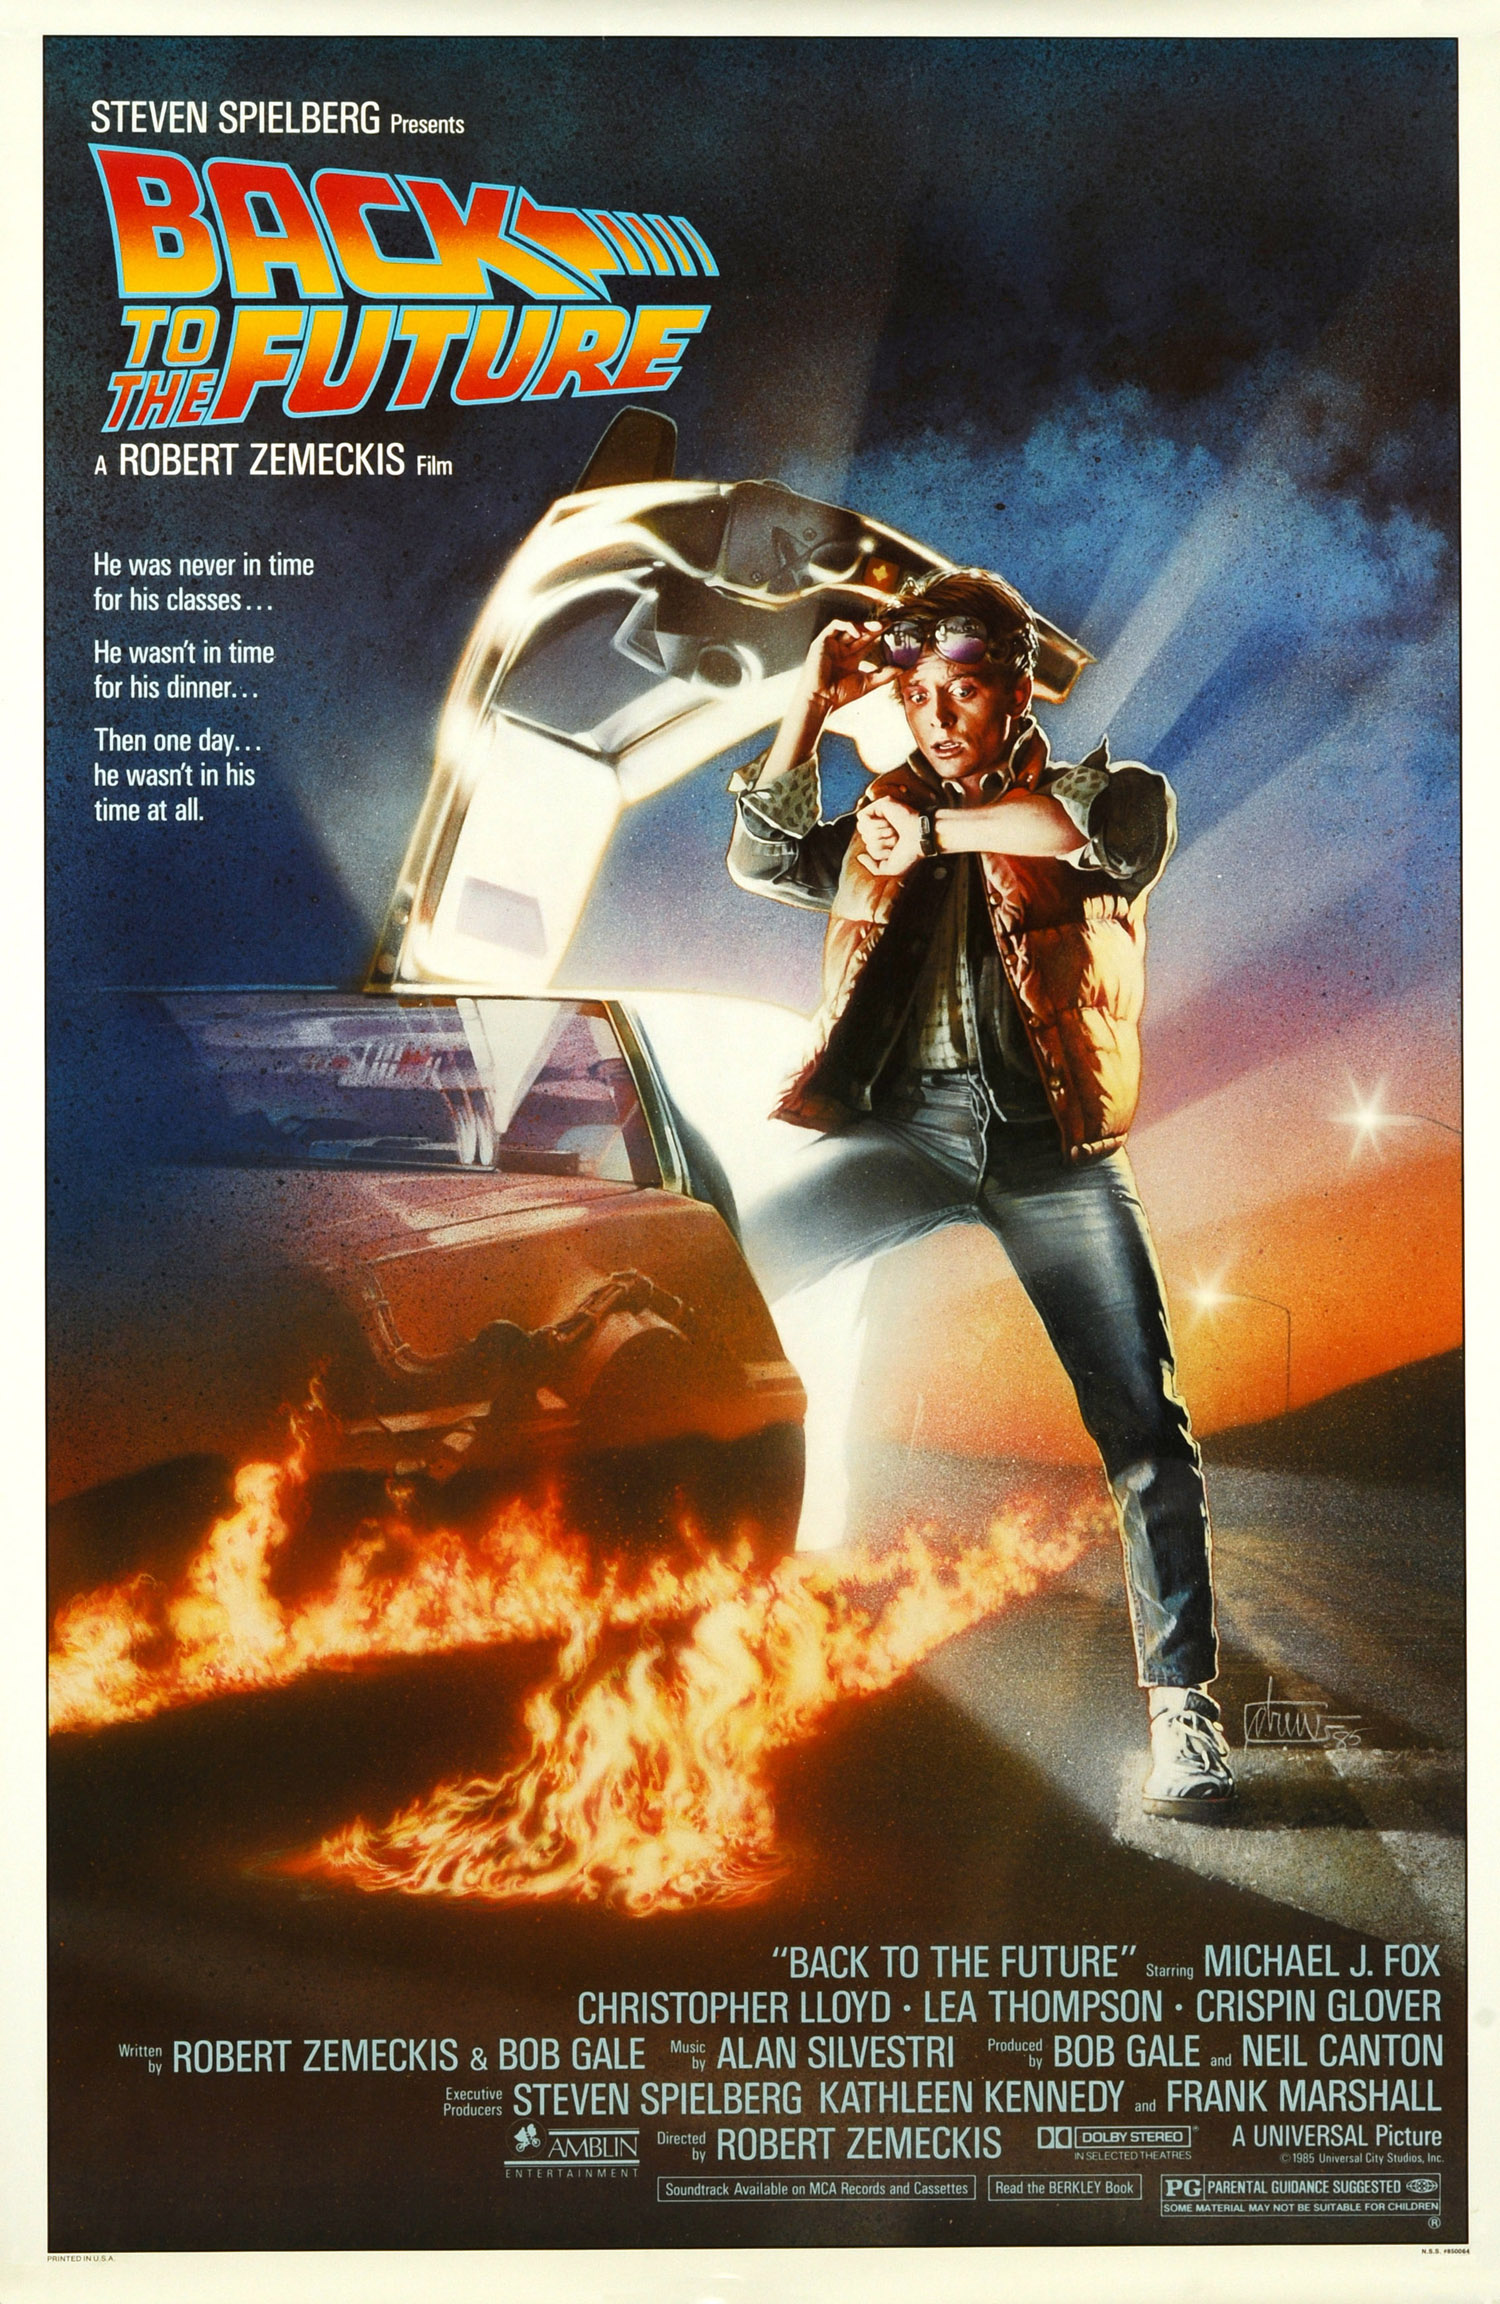 bttf movie poster